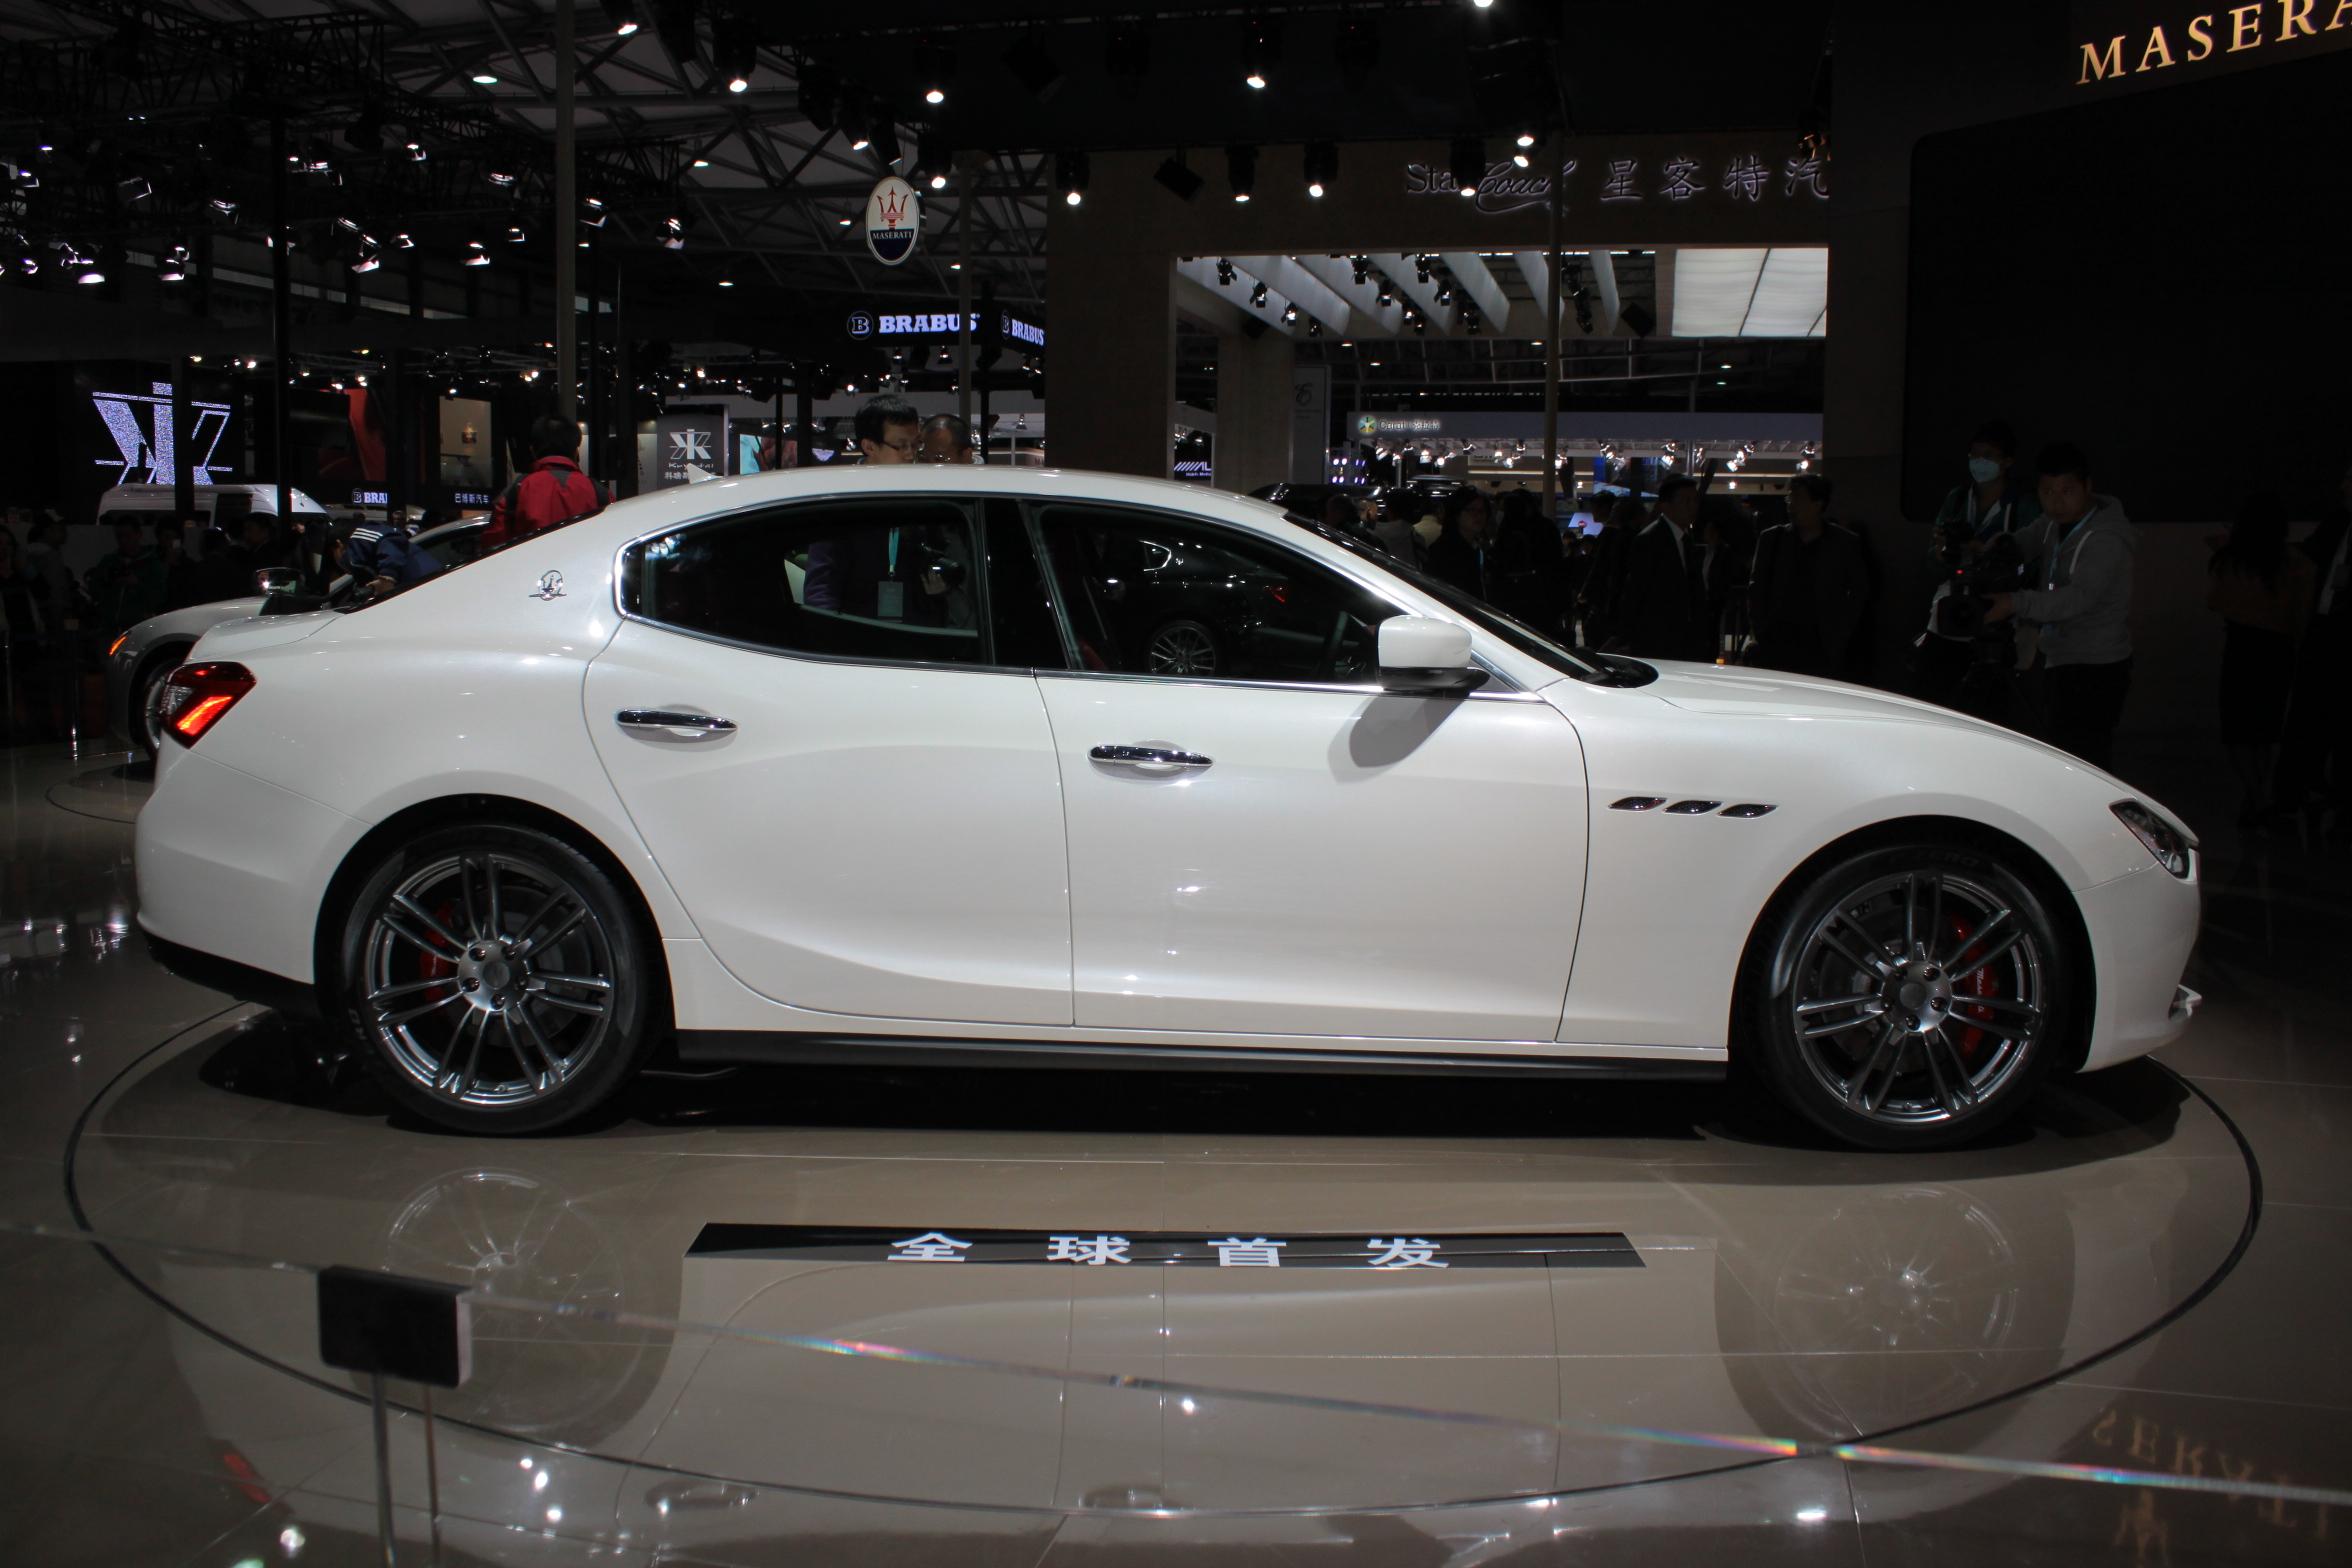 File Maserati Ghibli Autoshanghai 2013 02 Jpg